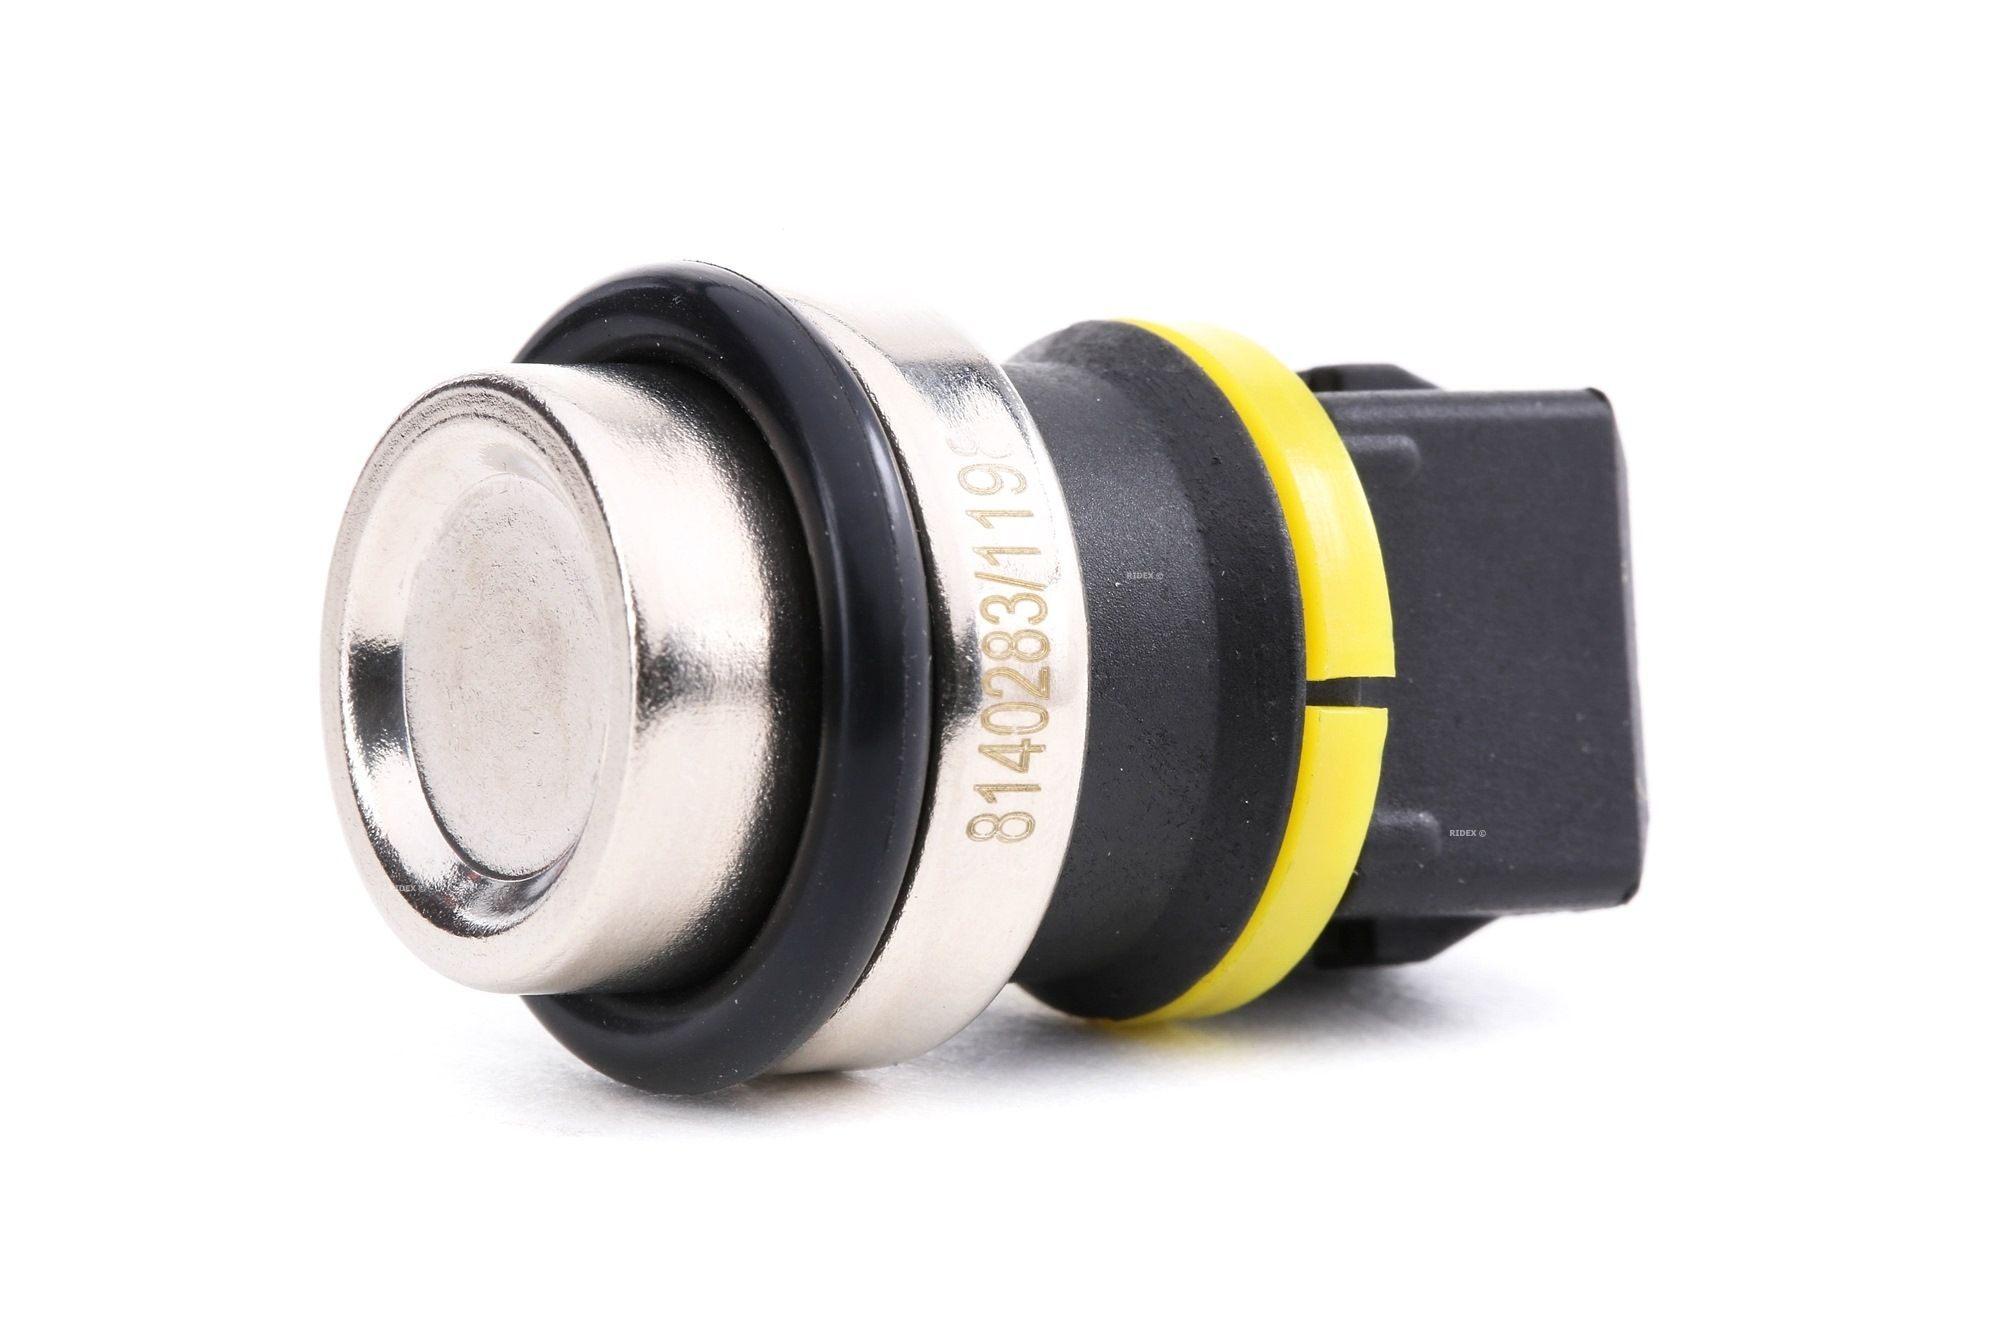 RIDEX: Original Zylinderkopf Temperatursensor 830C0015 (Pol-Anzahl: 4-polig)